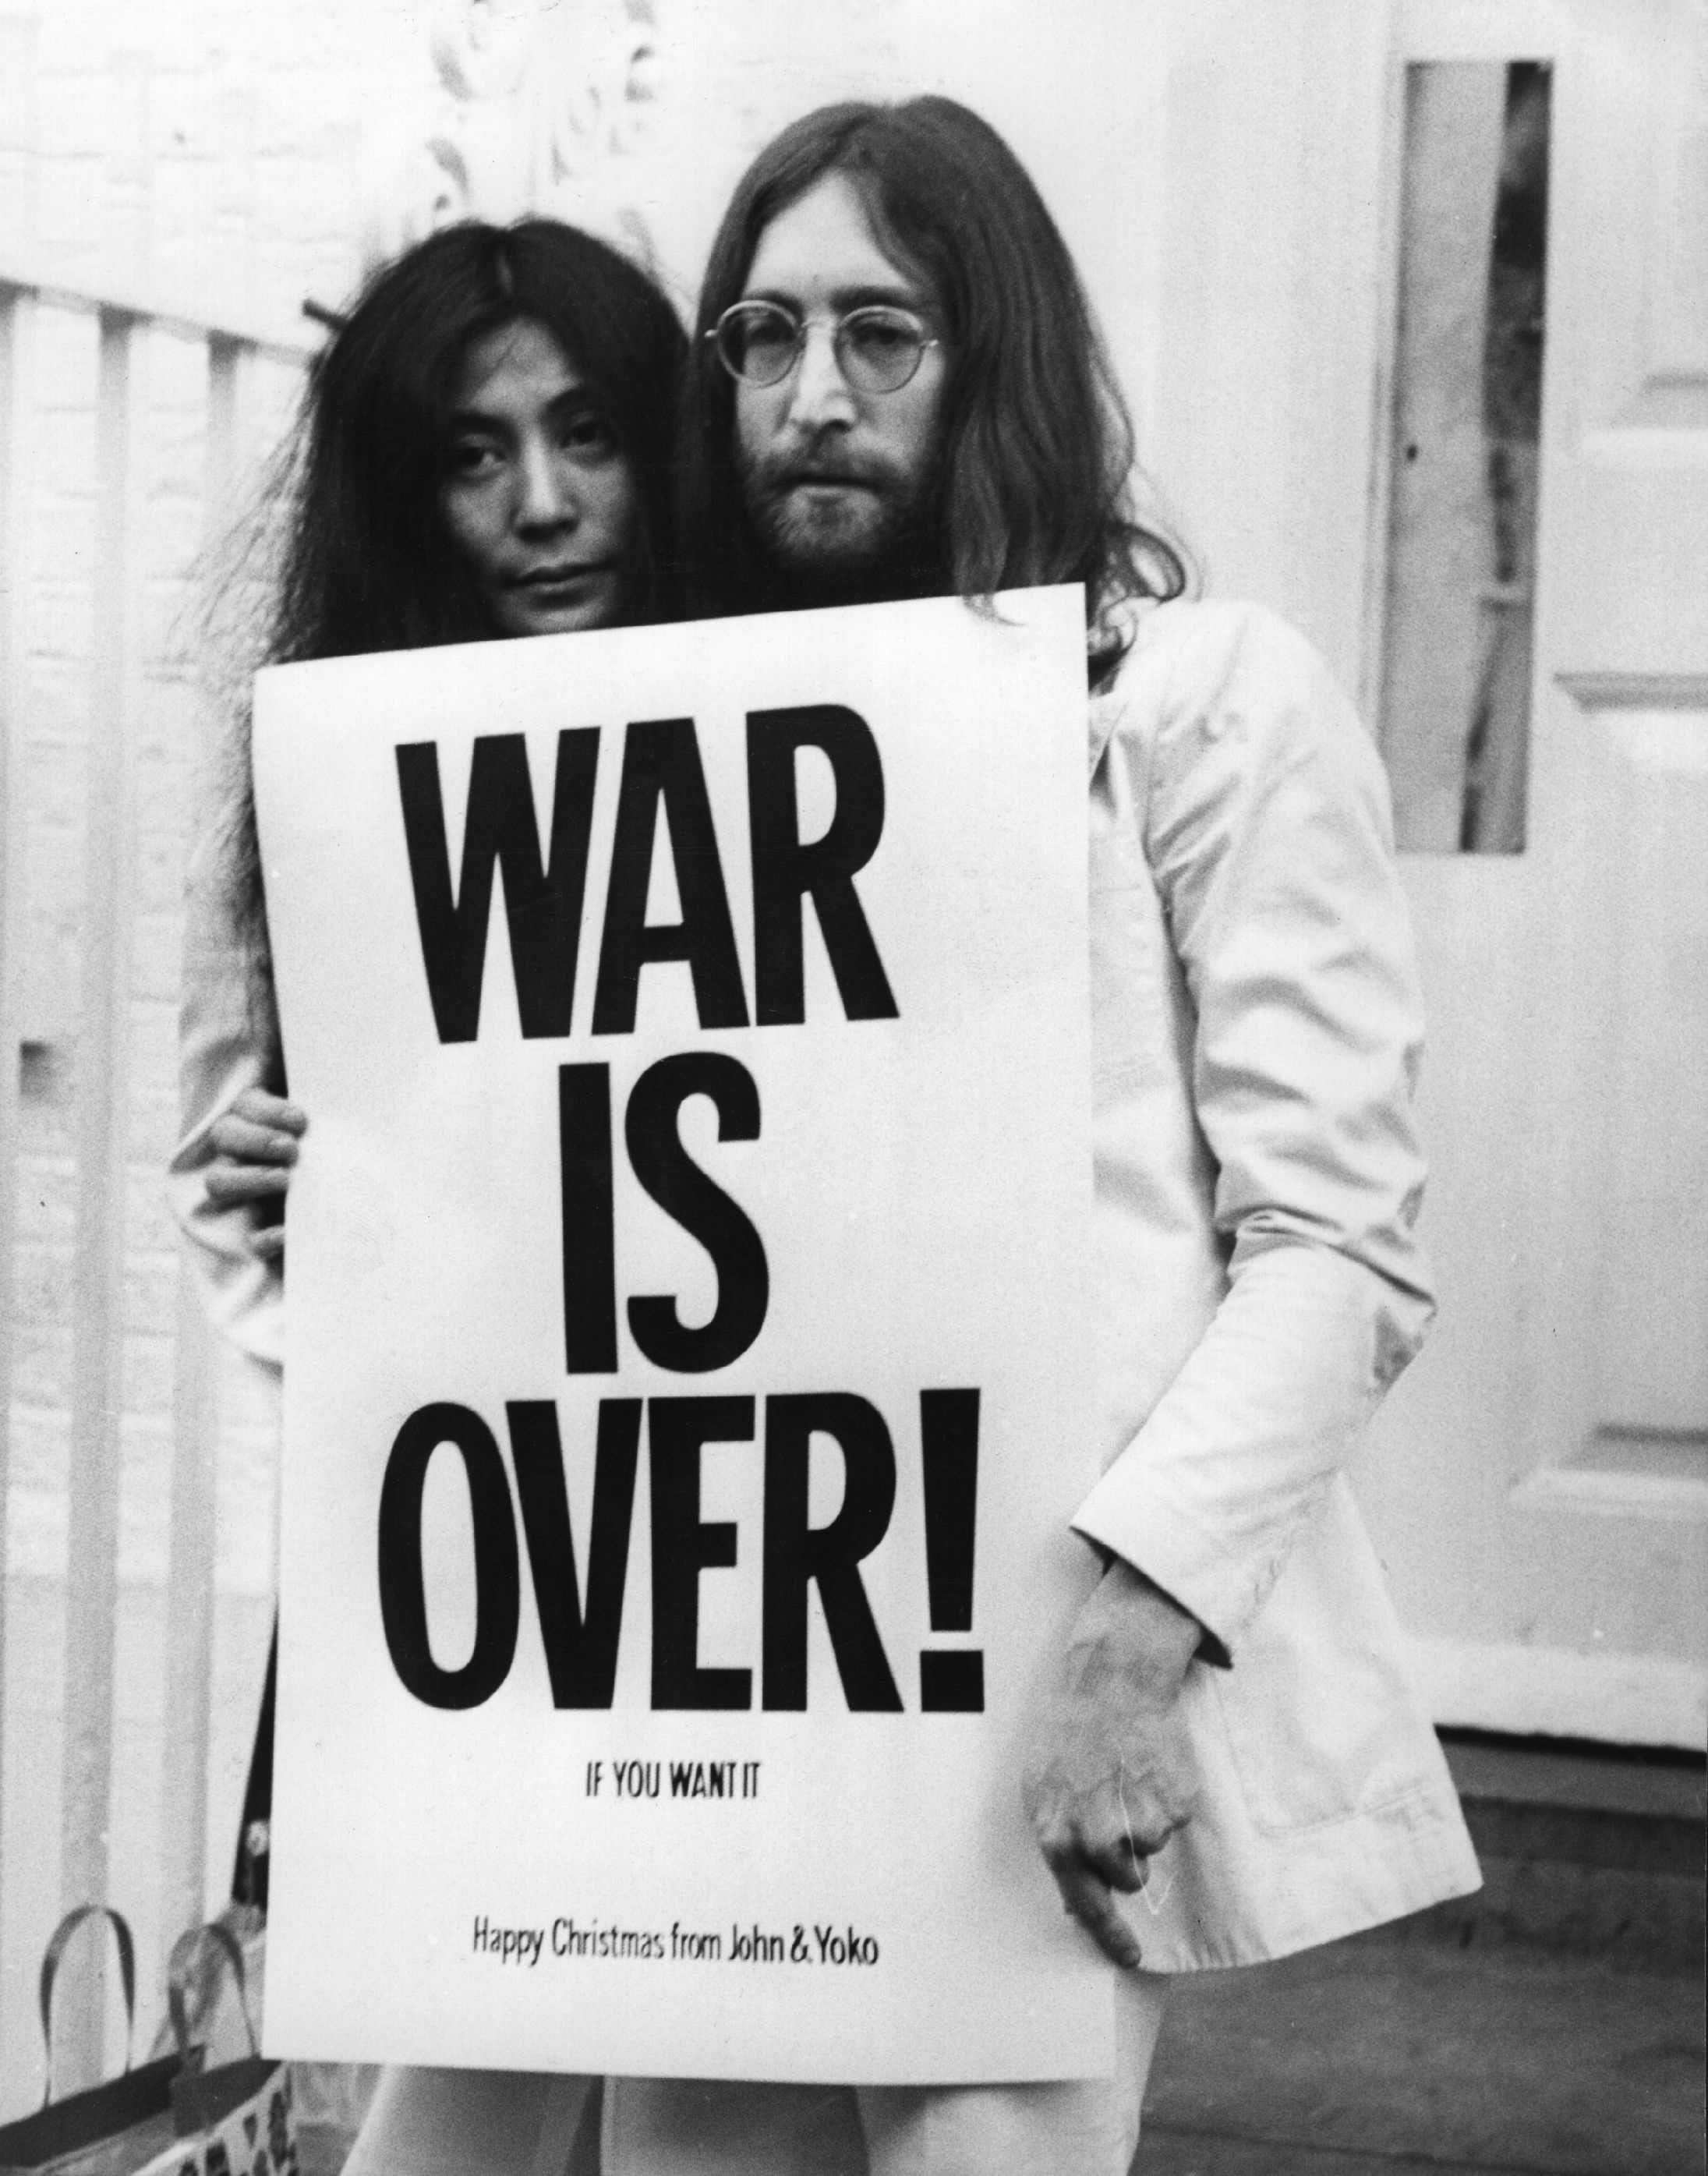 John Lennon Yoko Ono Photographs